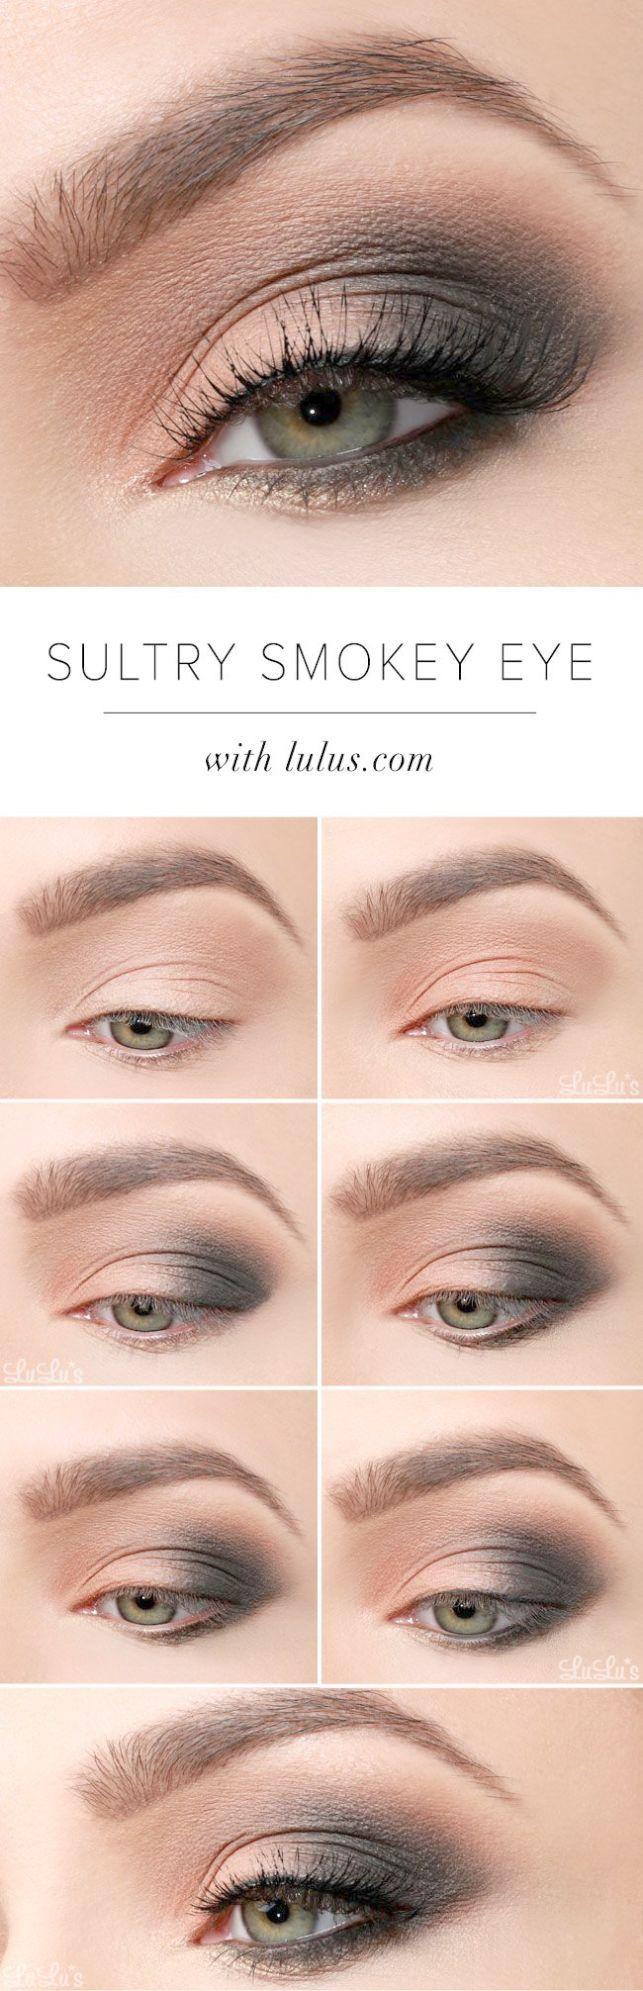 Over 12 Eye Makeup Tips  Saubhaya Makeup